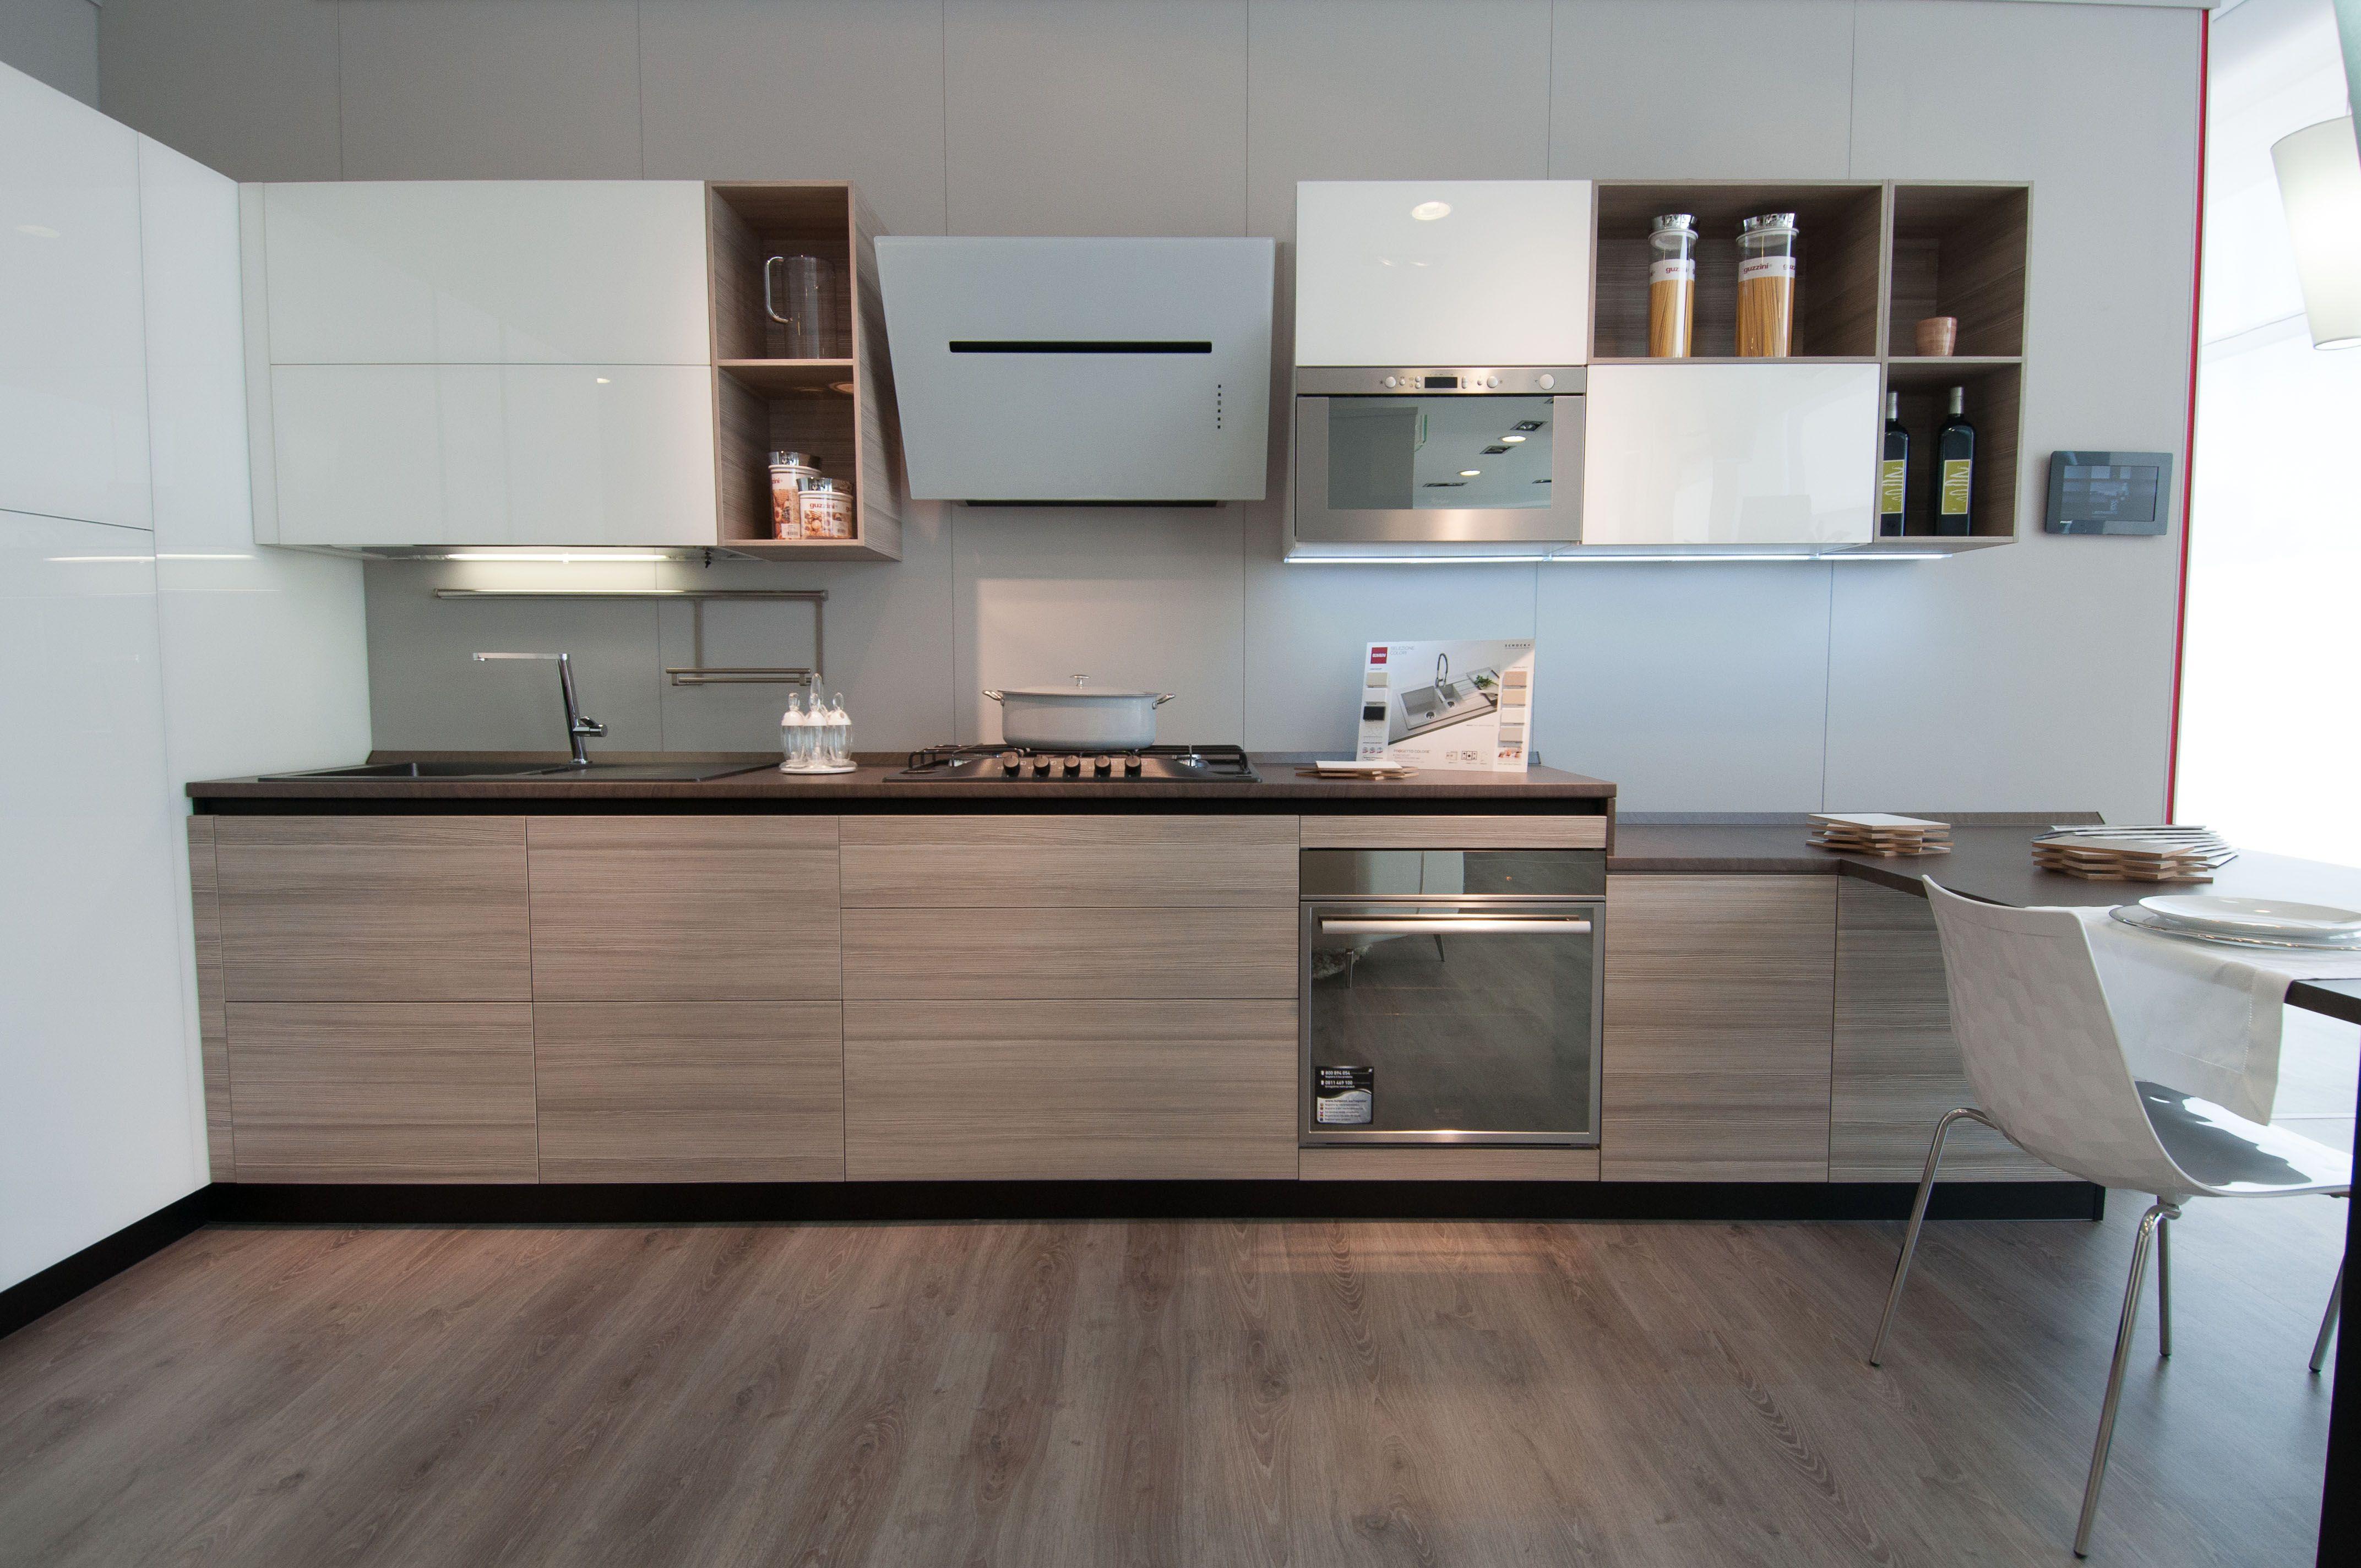 Cucine moderne Scavolini - Showroom Scavolini Verona | Kitchen ...